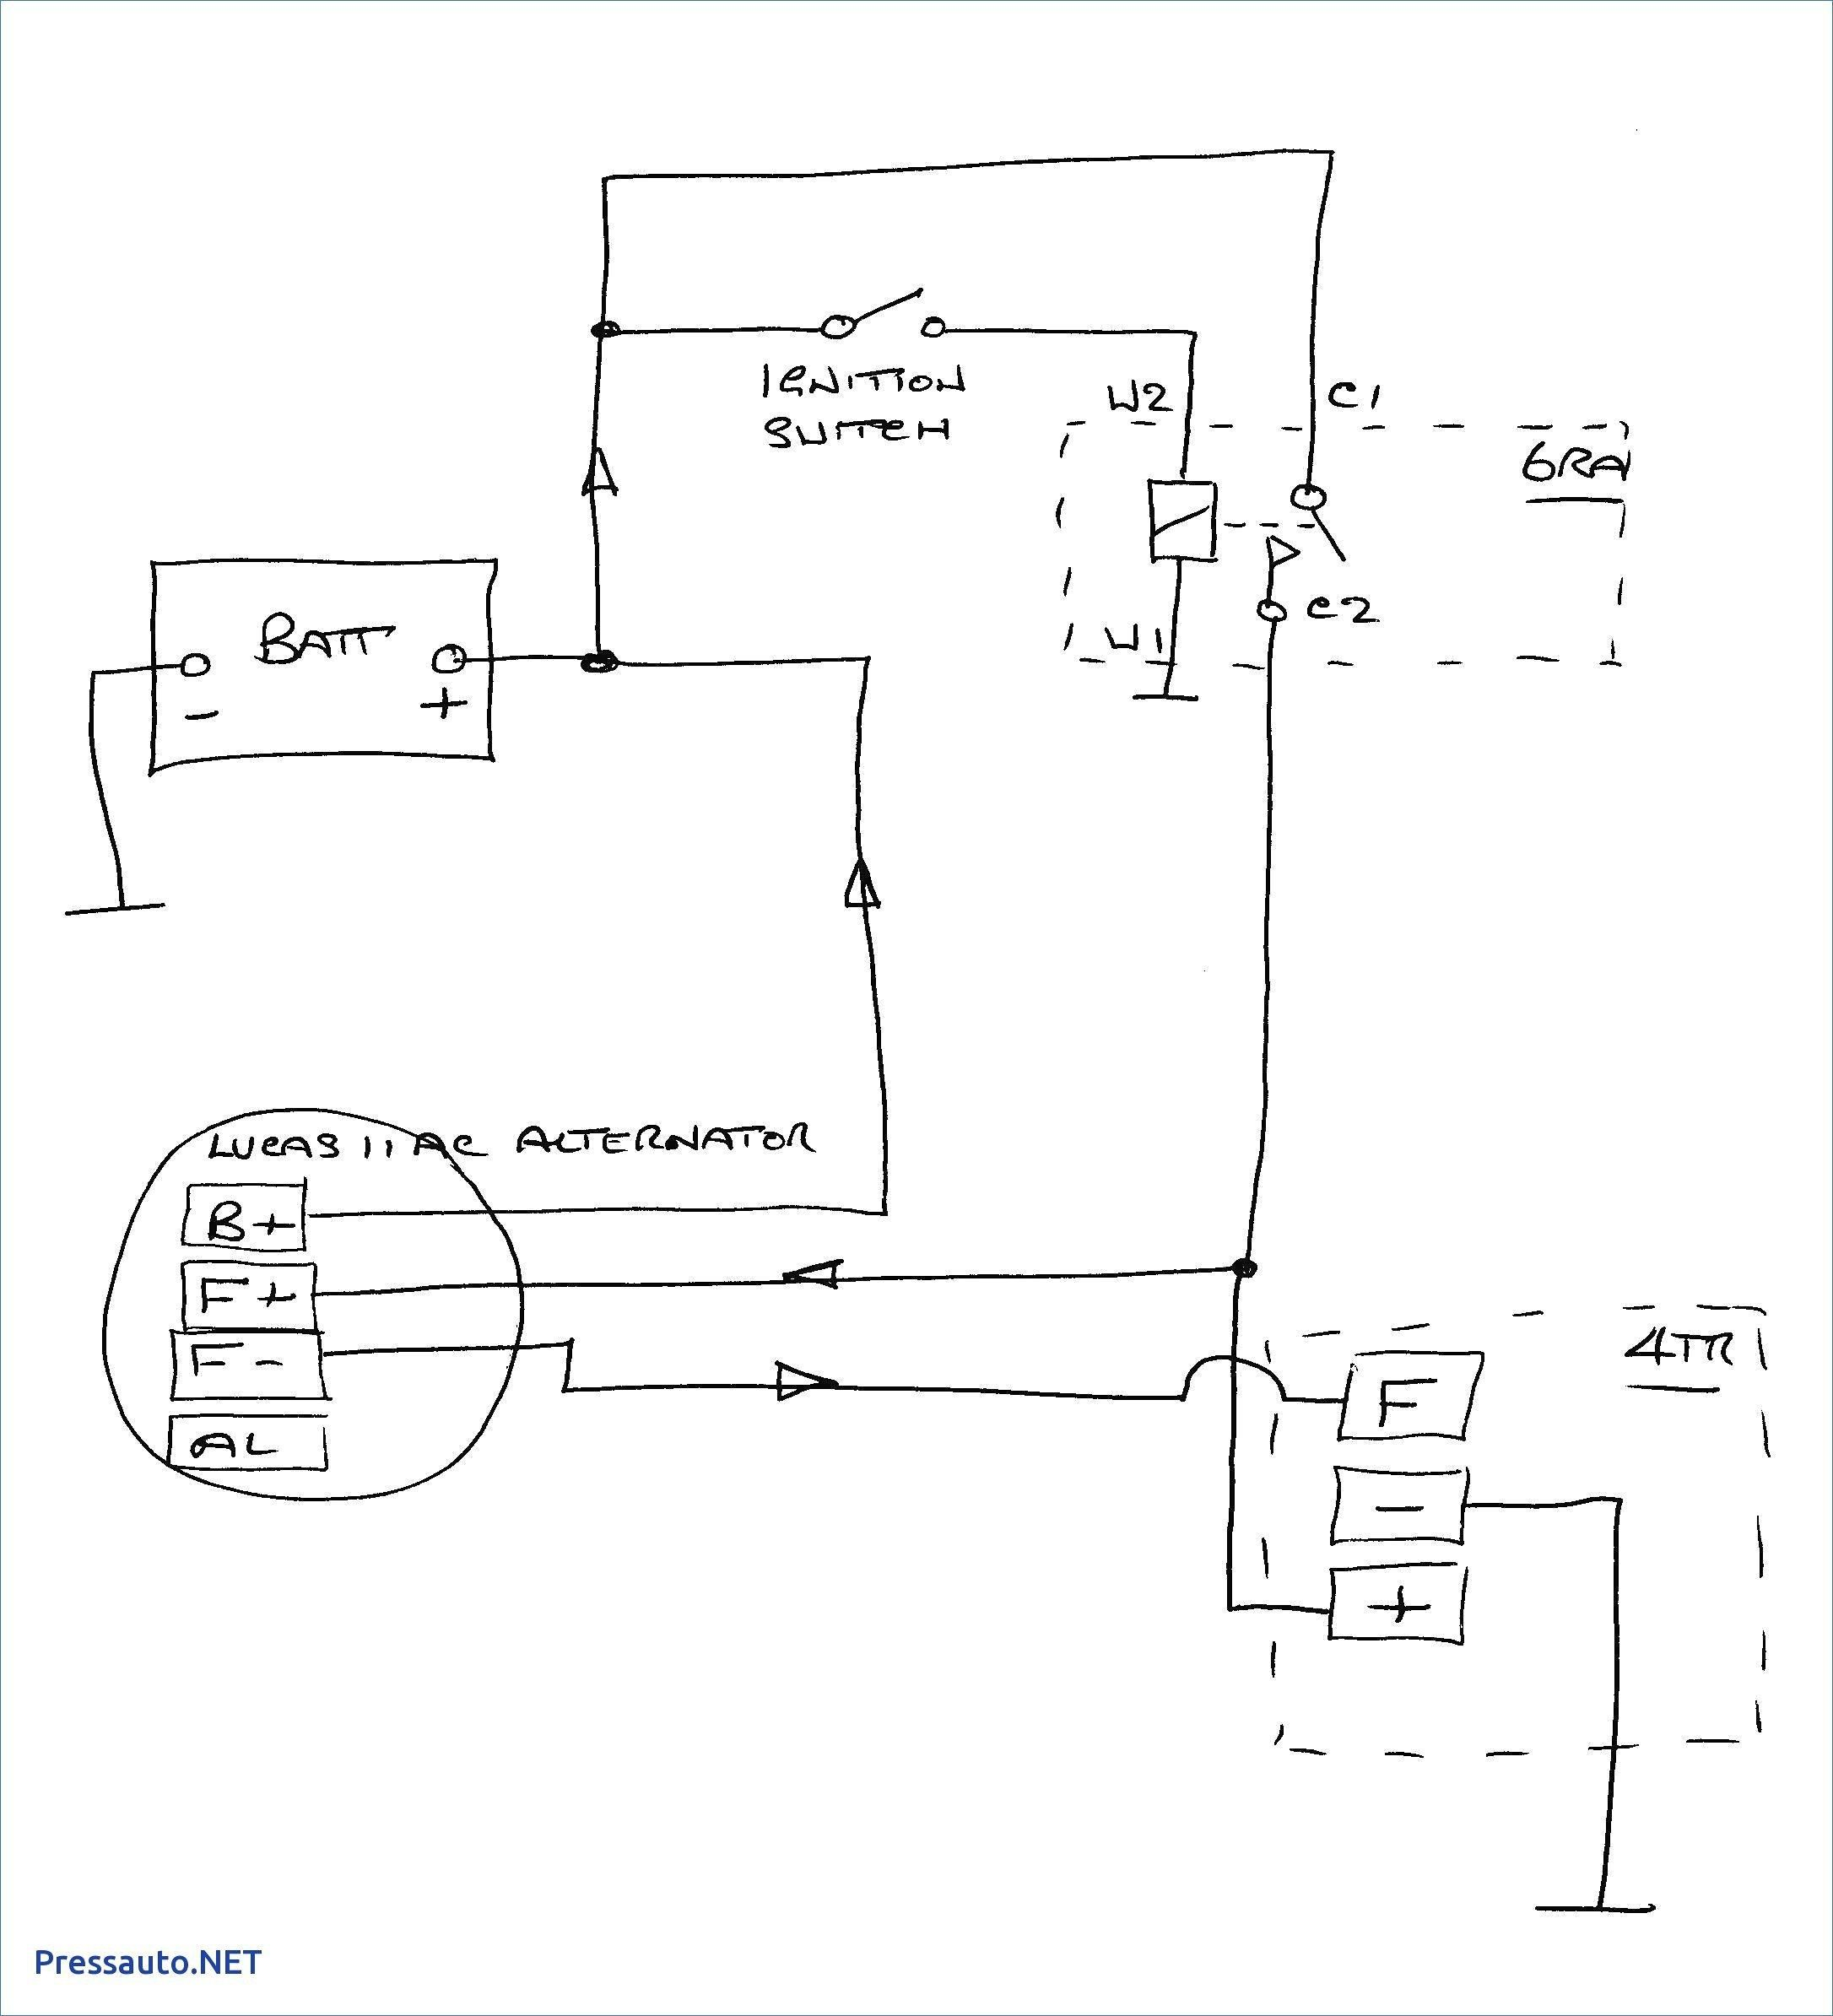 New Mitsubishi Generator Wiring Diagram Diagram Diagramsample Diagramtemplate Wiringdiagram Diagramchart Voltage Regulator Electrical Diagram Alternator